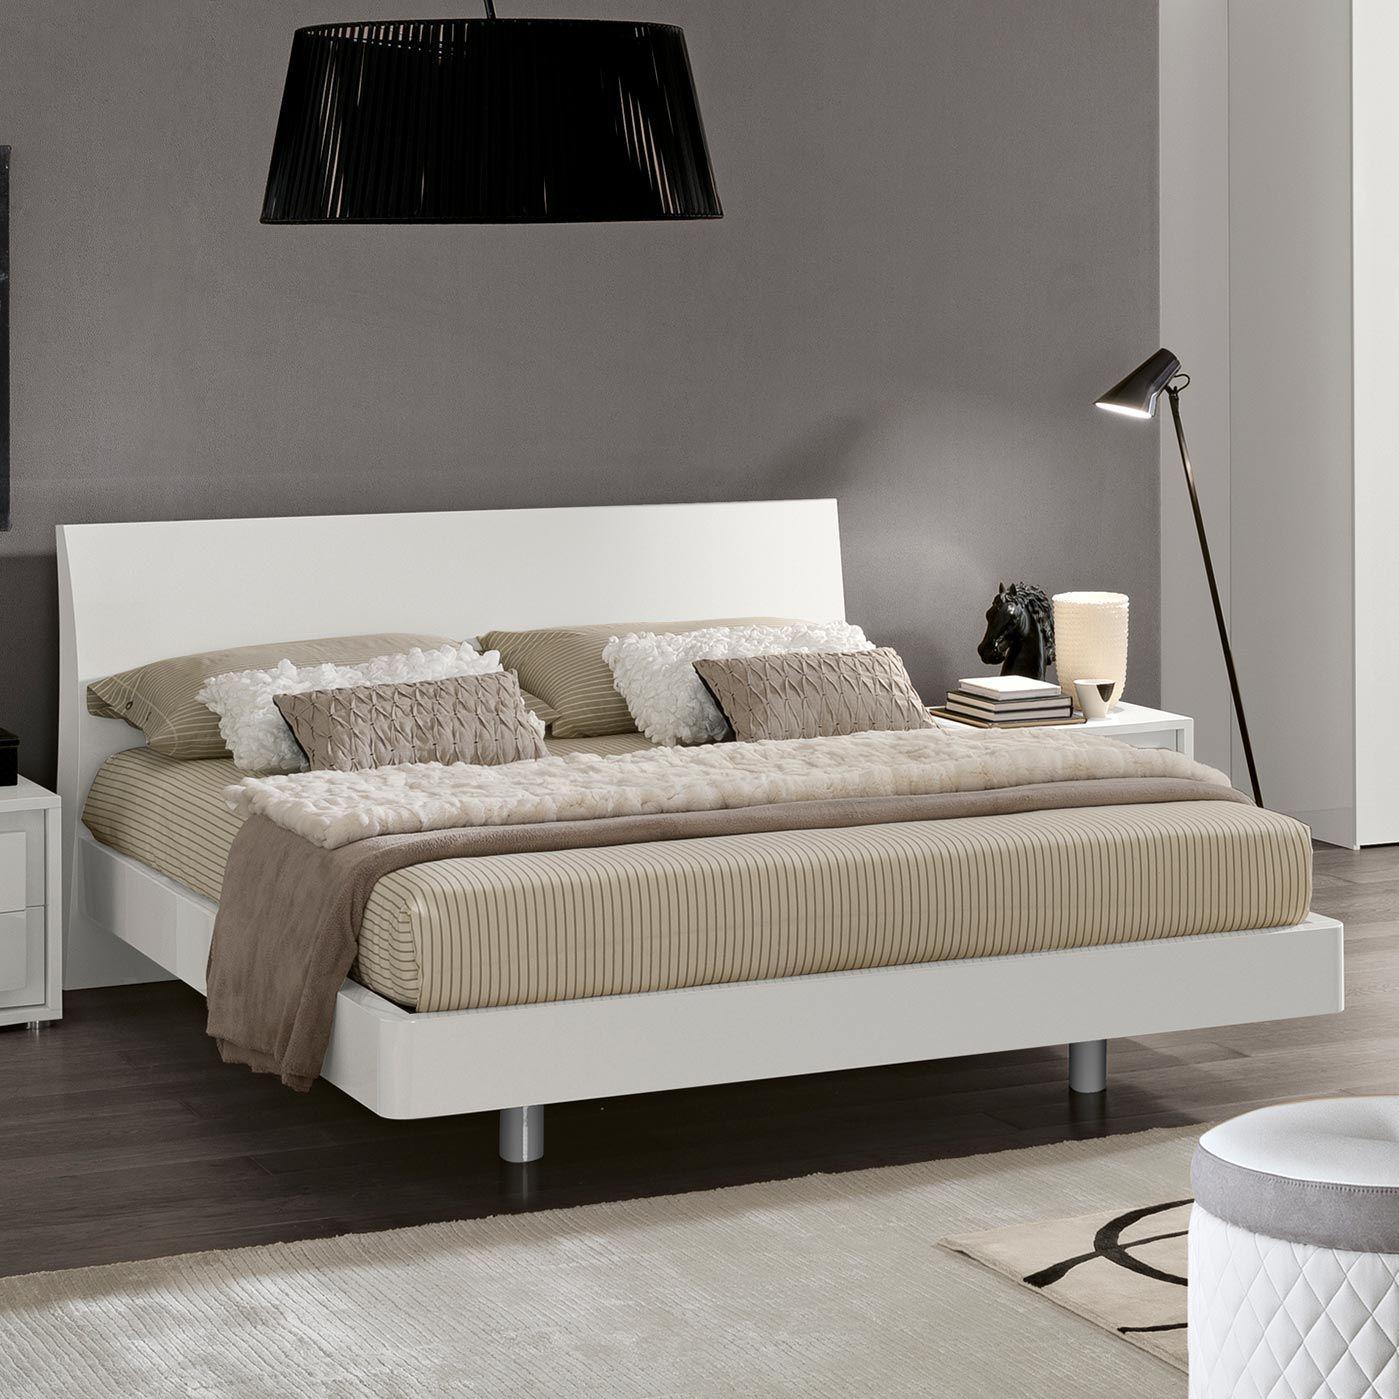 Madeinitaly Italianfurniture Italy Italian Italiandesign Designerfurniture Designerbeds Italianbeds Beds Italian Bed Furniture Design Luxury Furniture